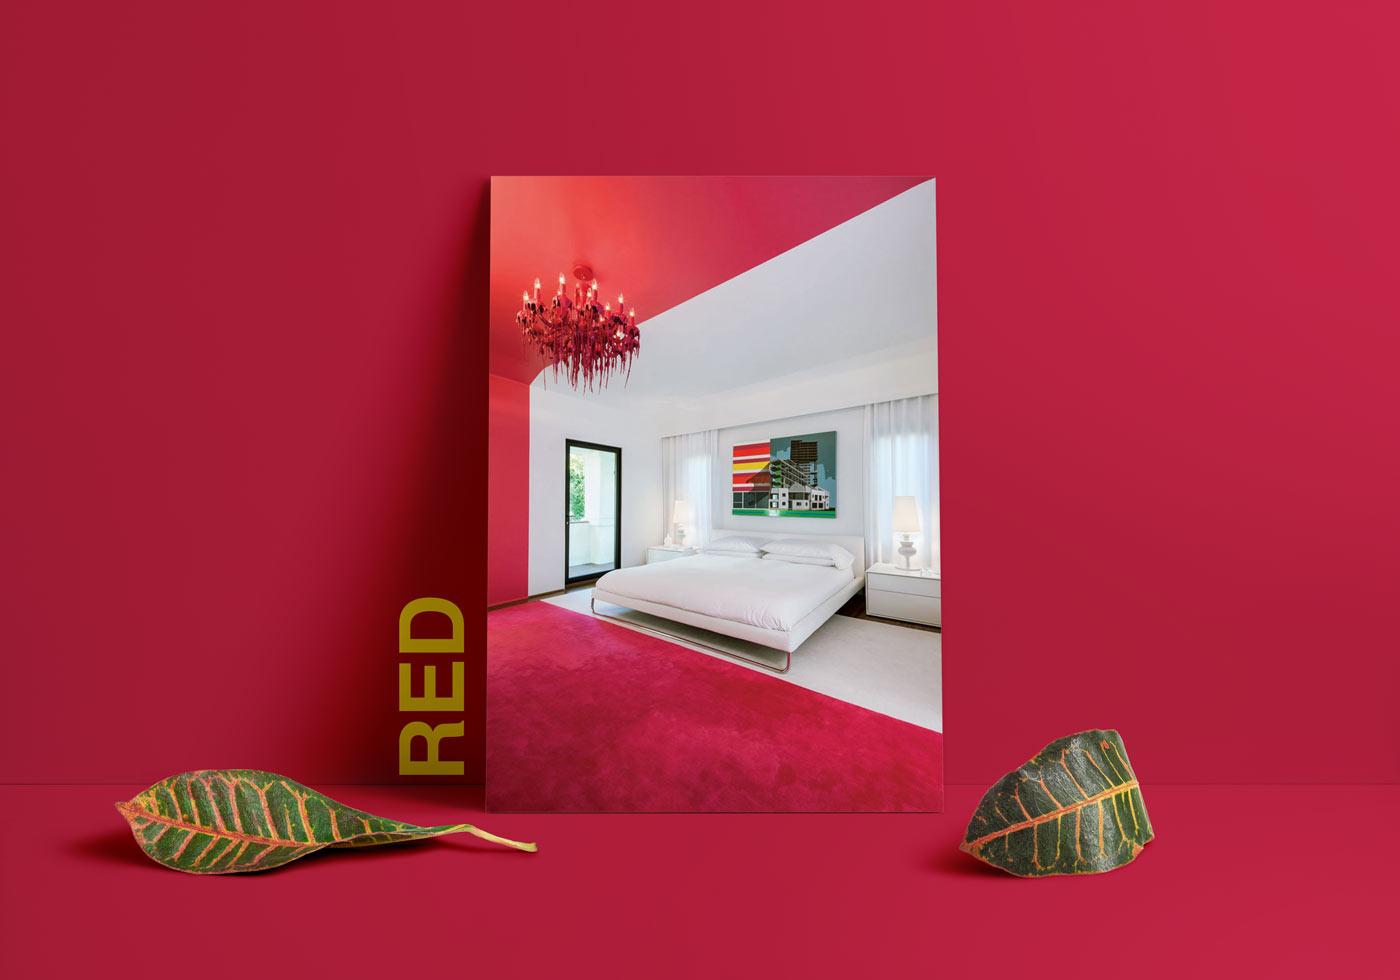 red interior design - طبع یا مزاج رنگ ها در دکوراسیون داخلی